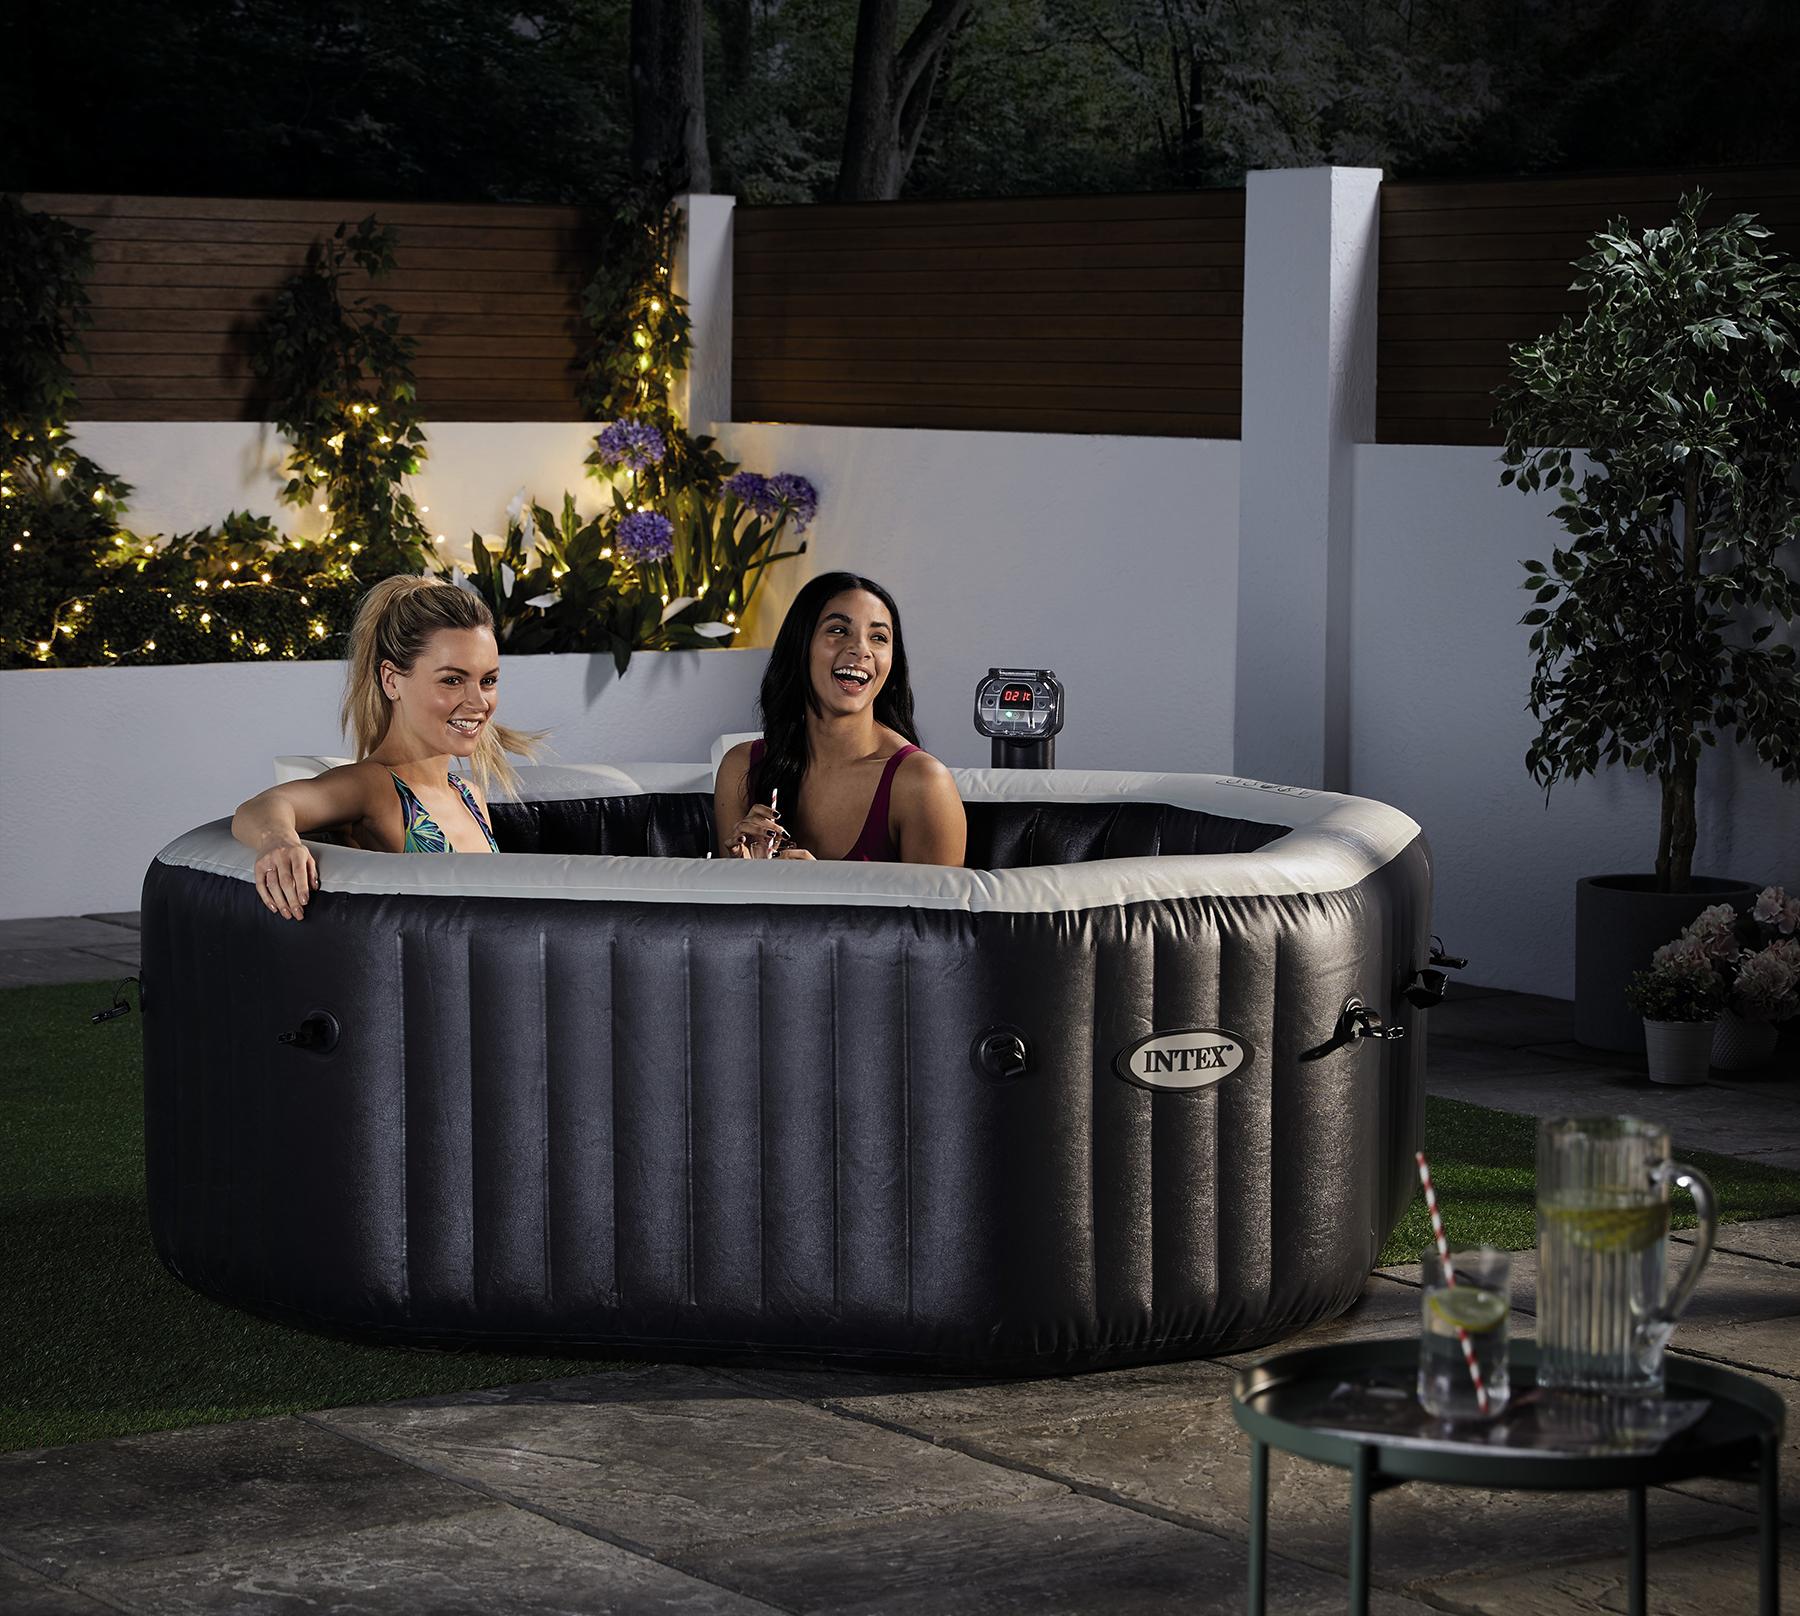 Garden hot tub. Image: Aldi